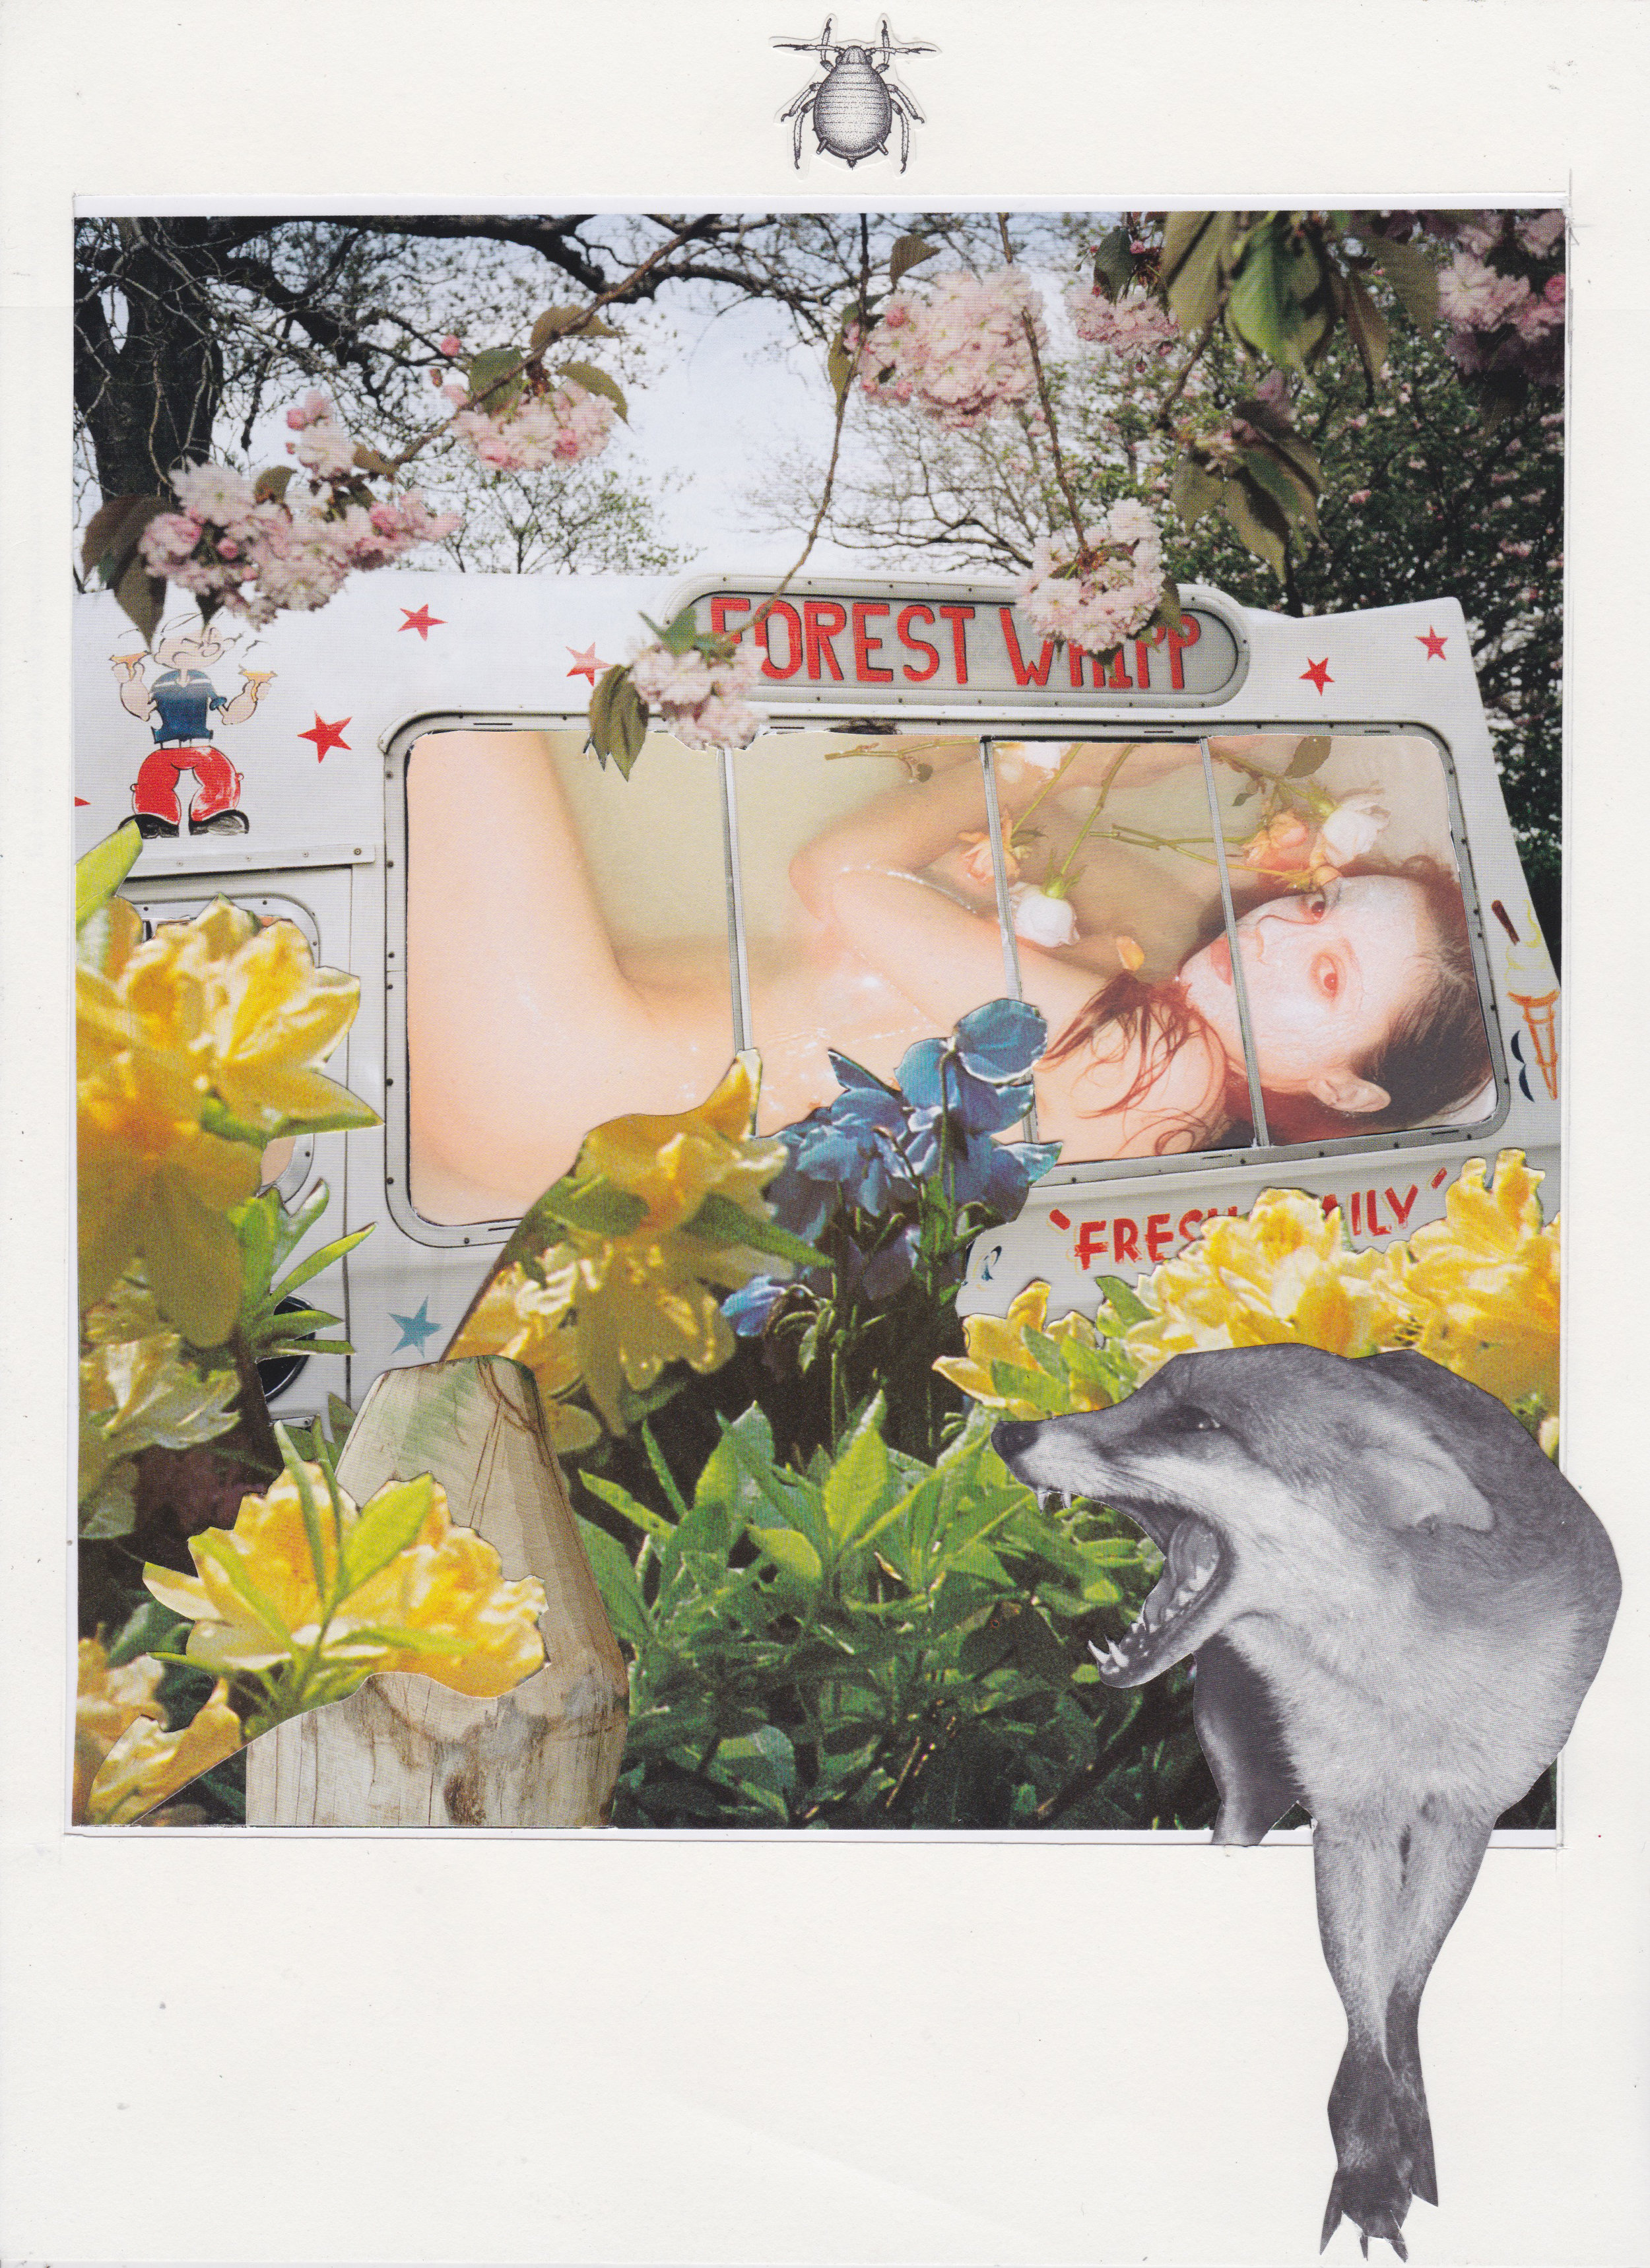 Forest Whipp